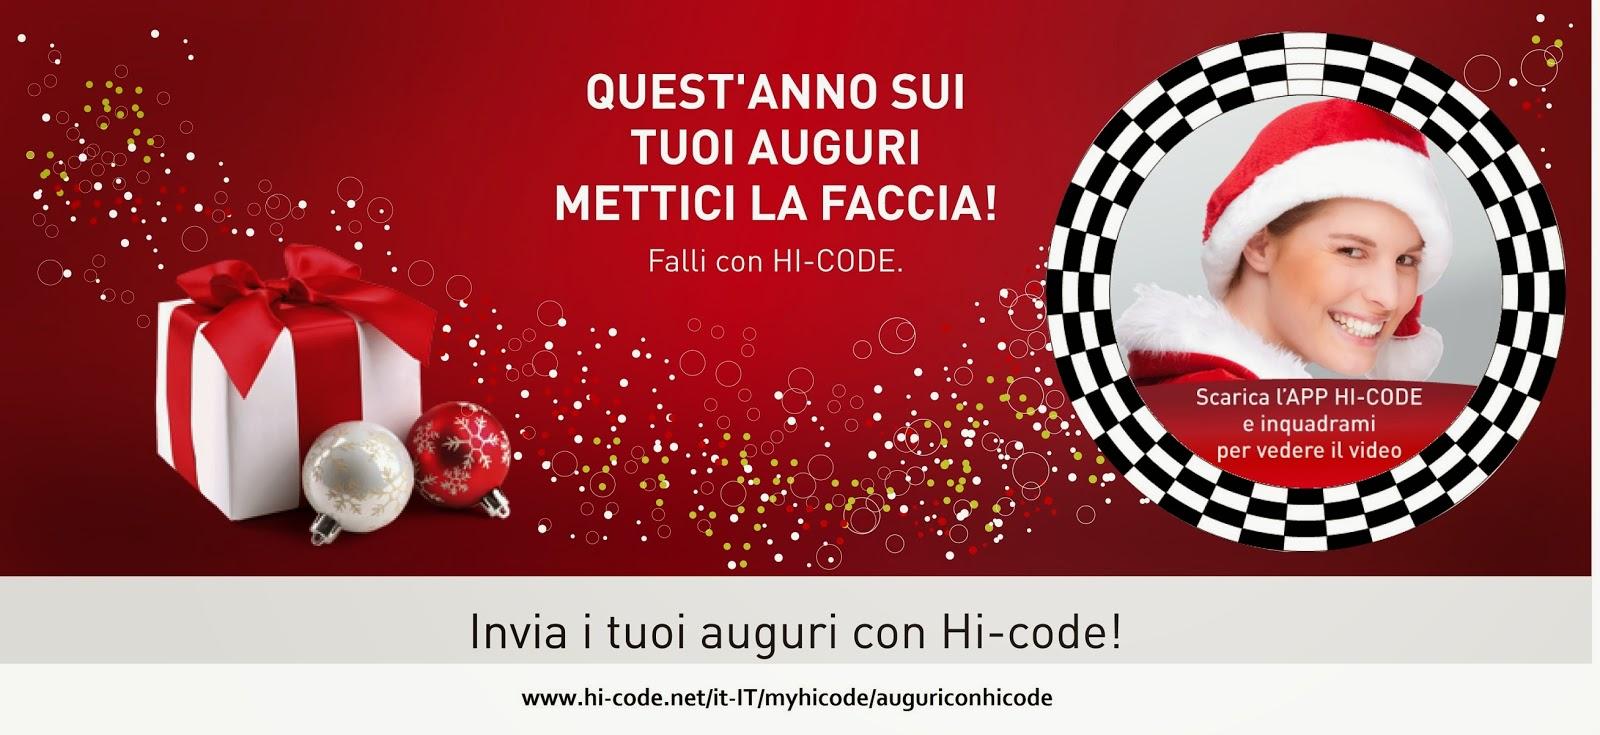 www.hi-code.net